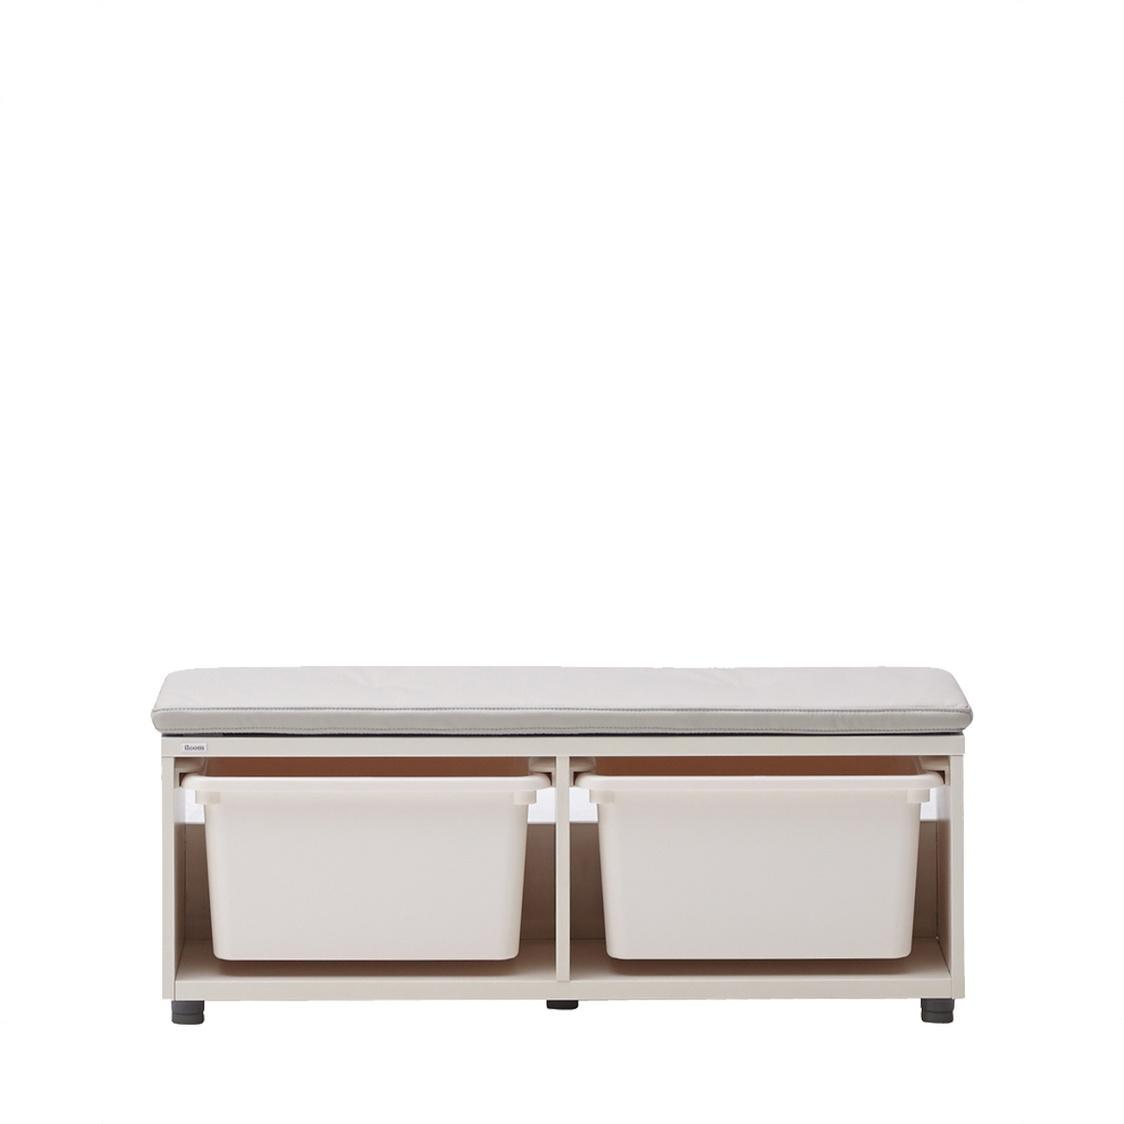 Iloom Eddi Kids 950W Bench With Storage Hsfp191-Iviv